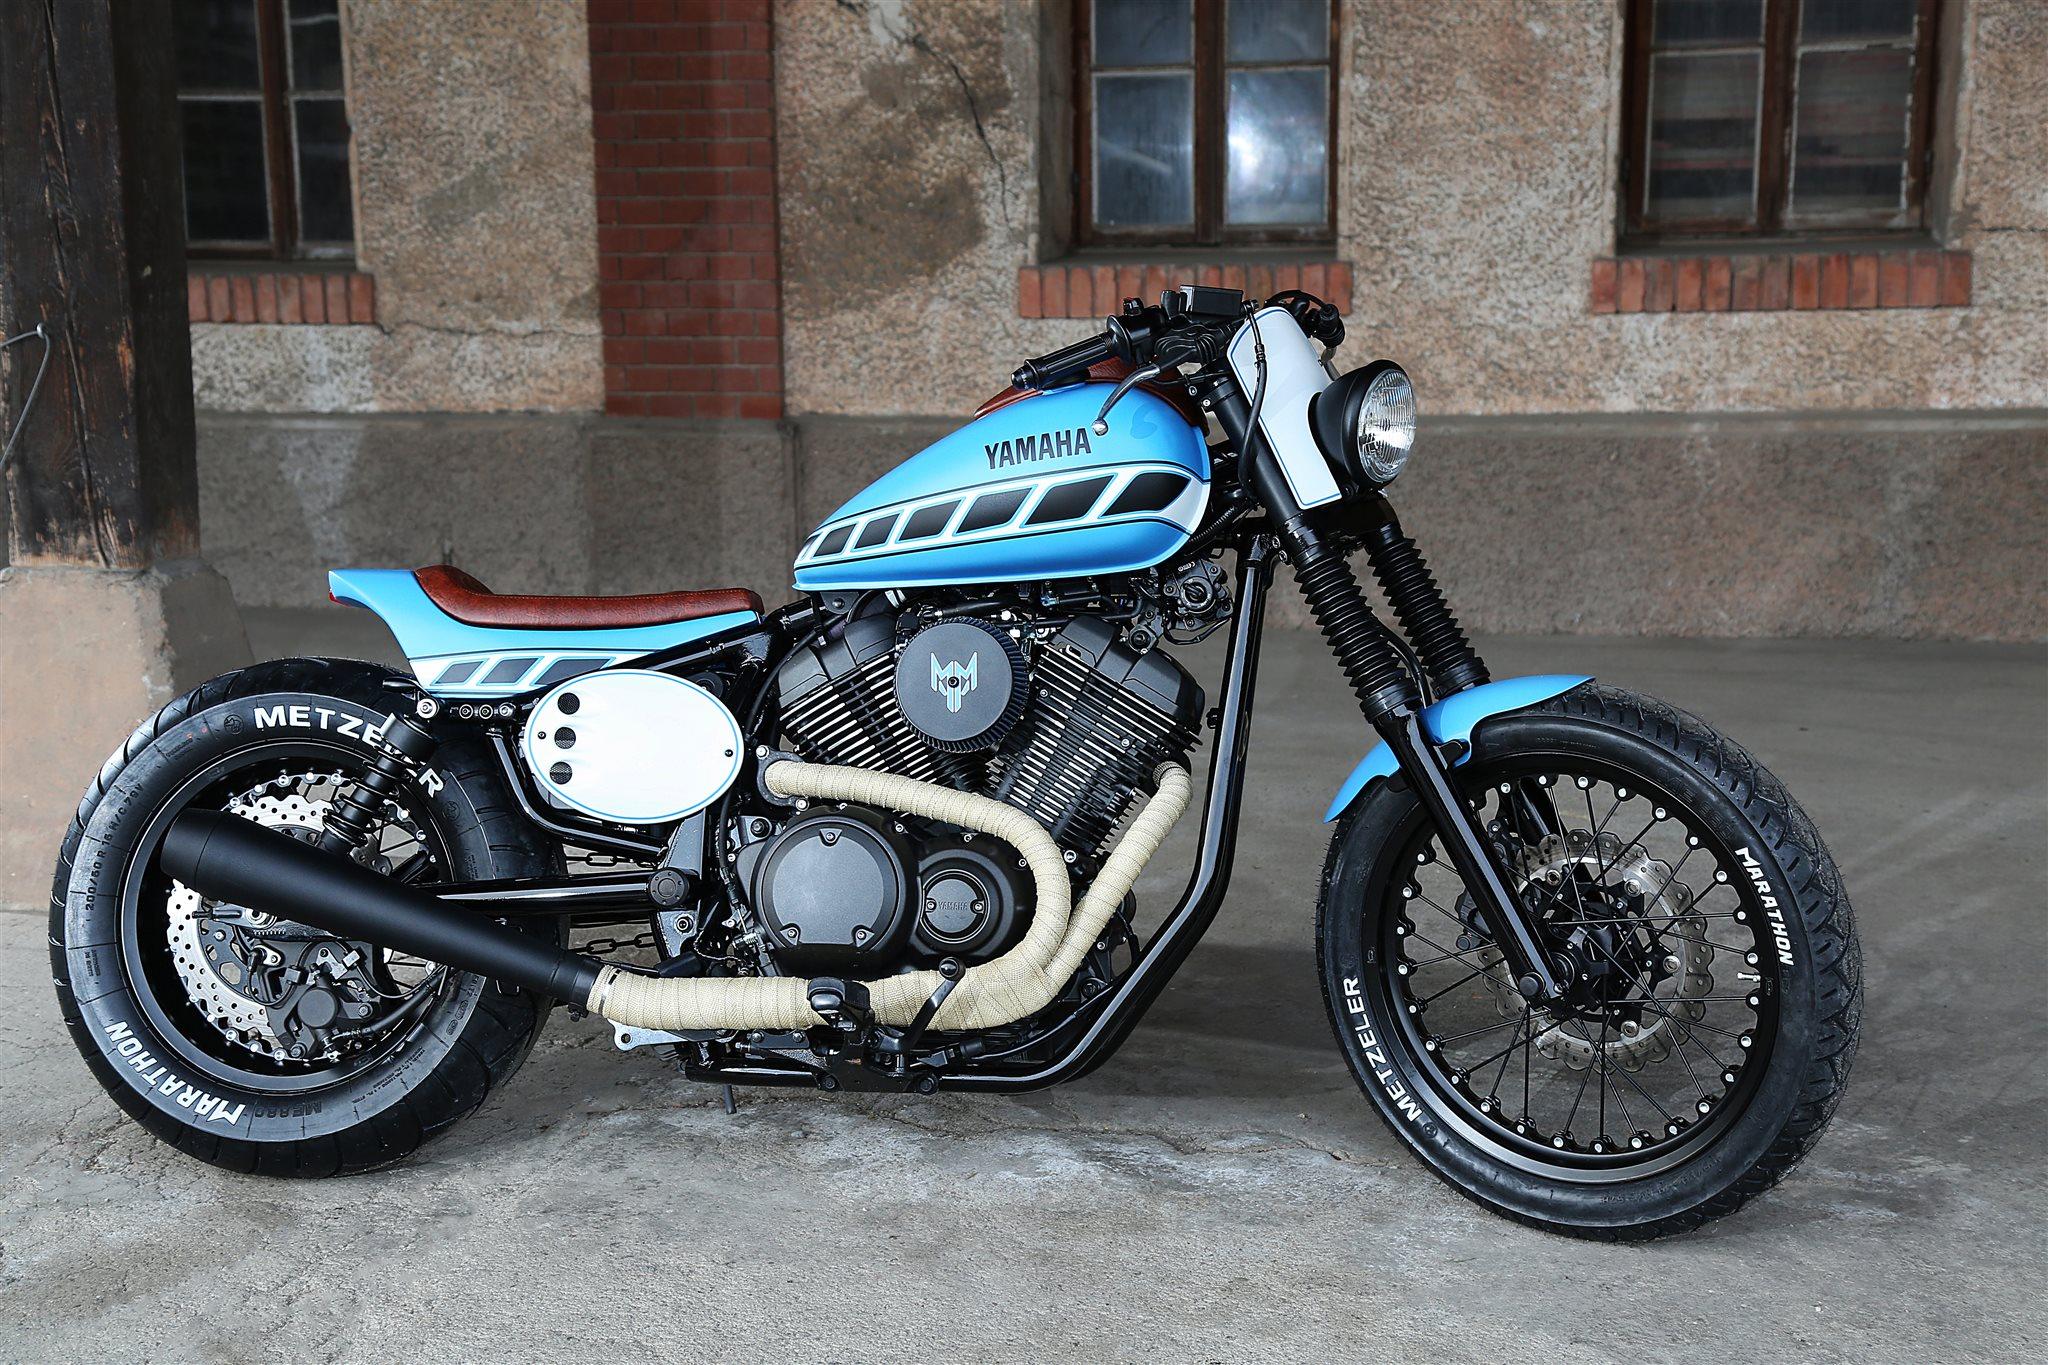 umgebautes motorrad yamaha xv 950 r von maurer motos ag. Black Bedroom Furniture Sets. Home Design Ideas